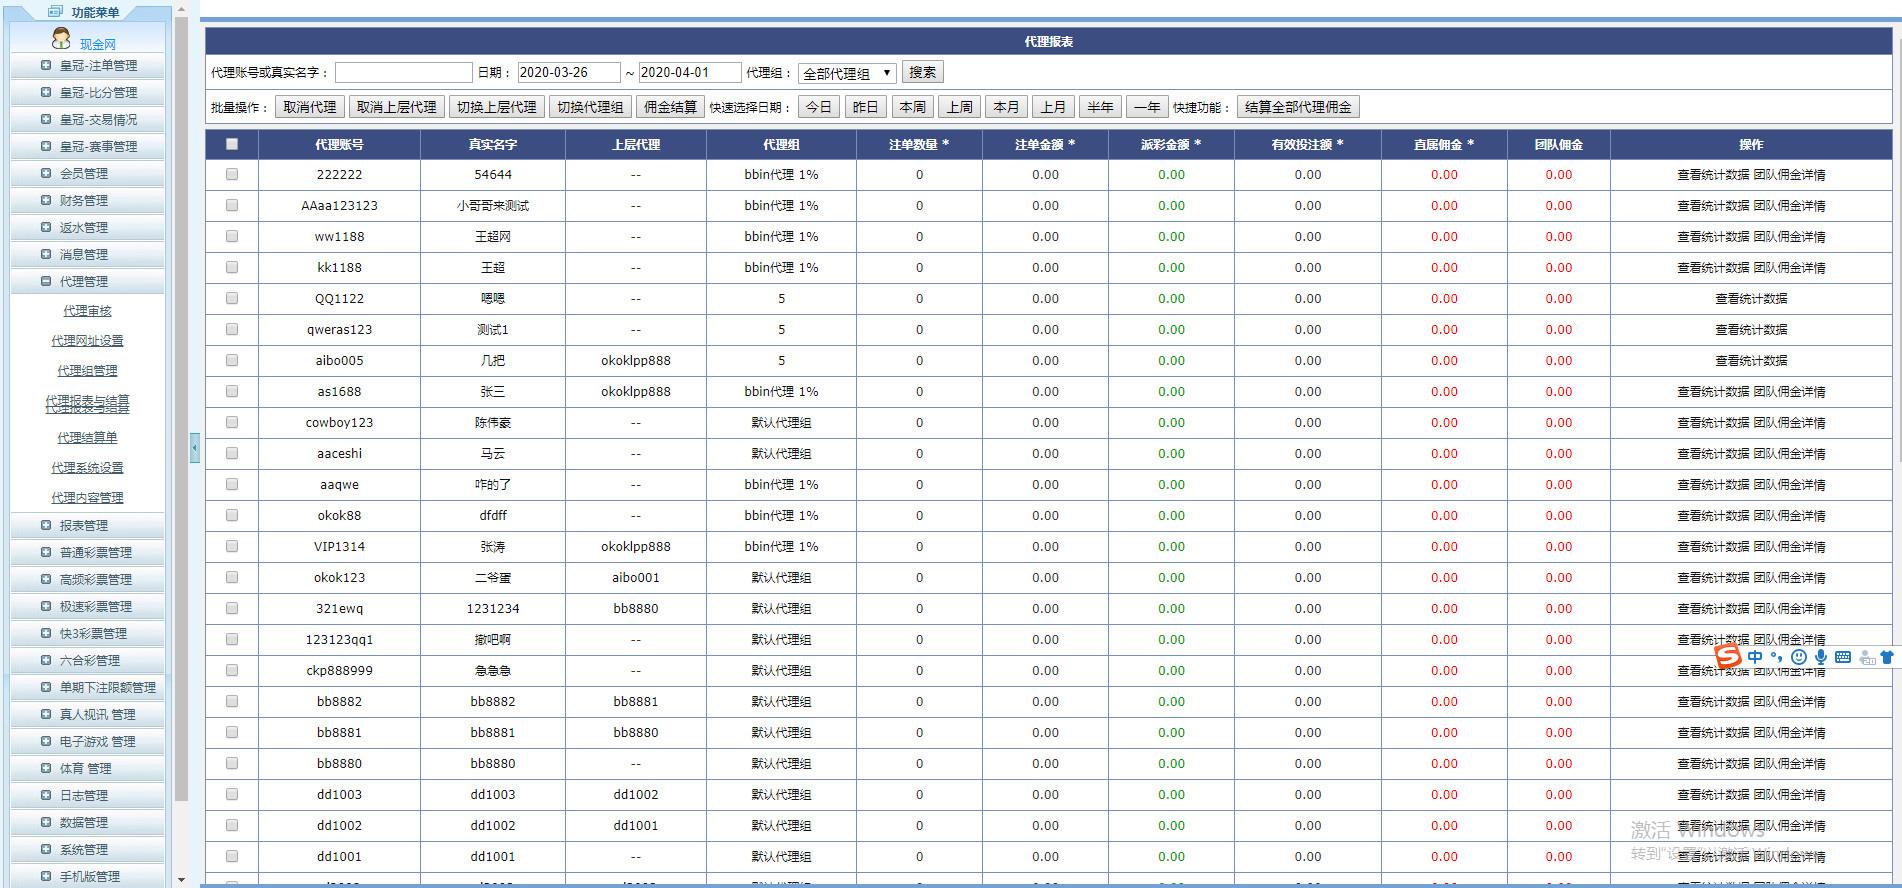 【BC源码】爱博最新独立代理系统+七星C玩法+二开修复